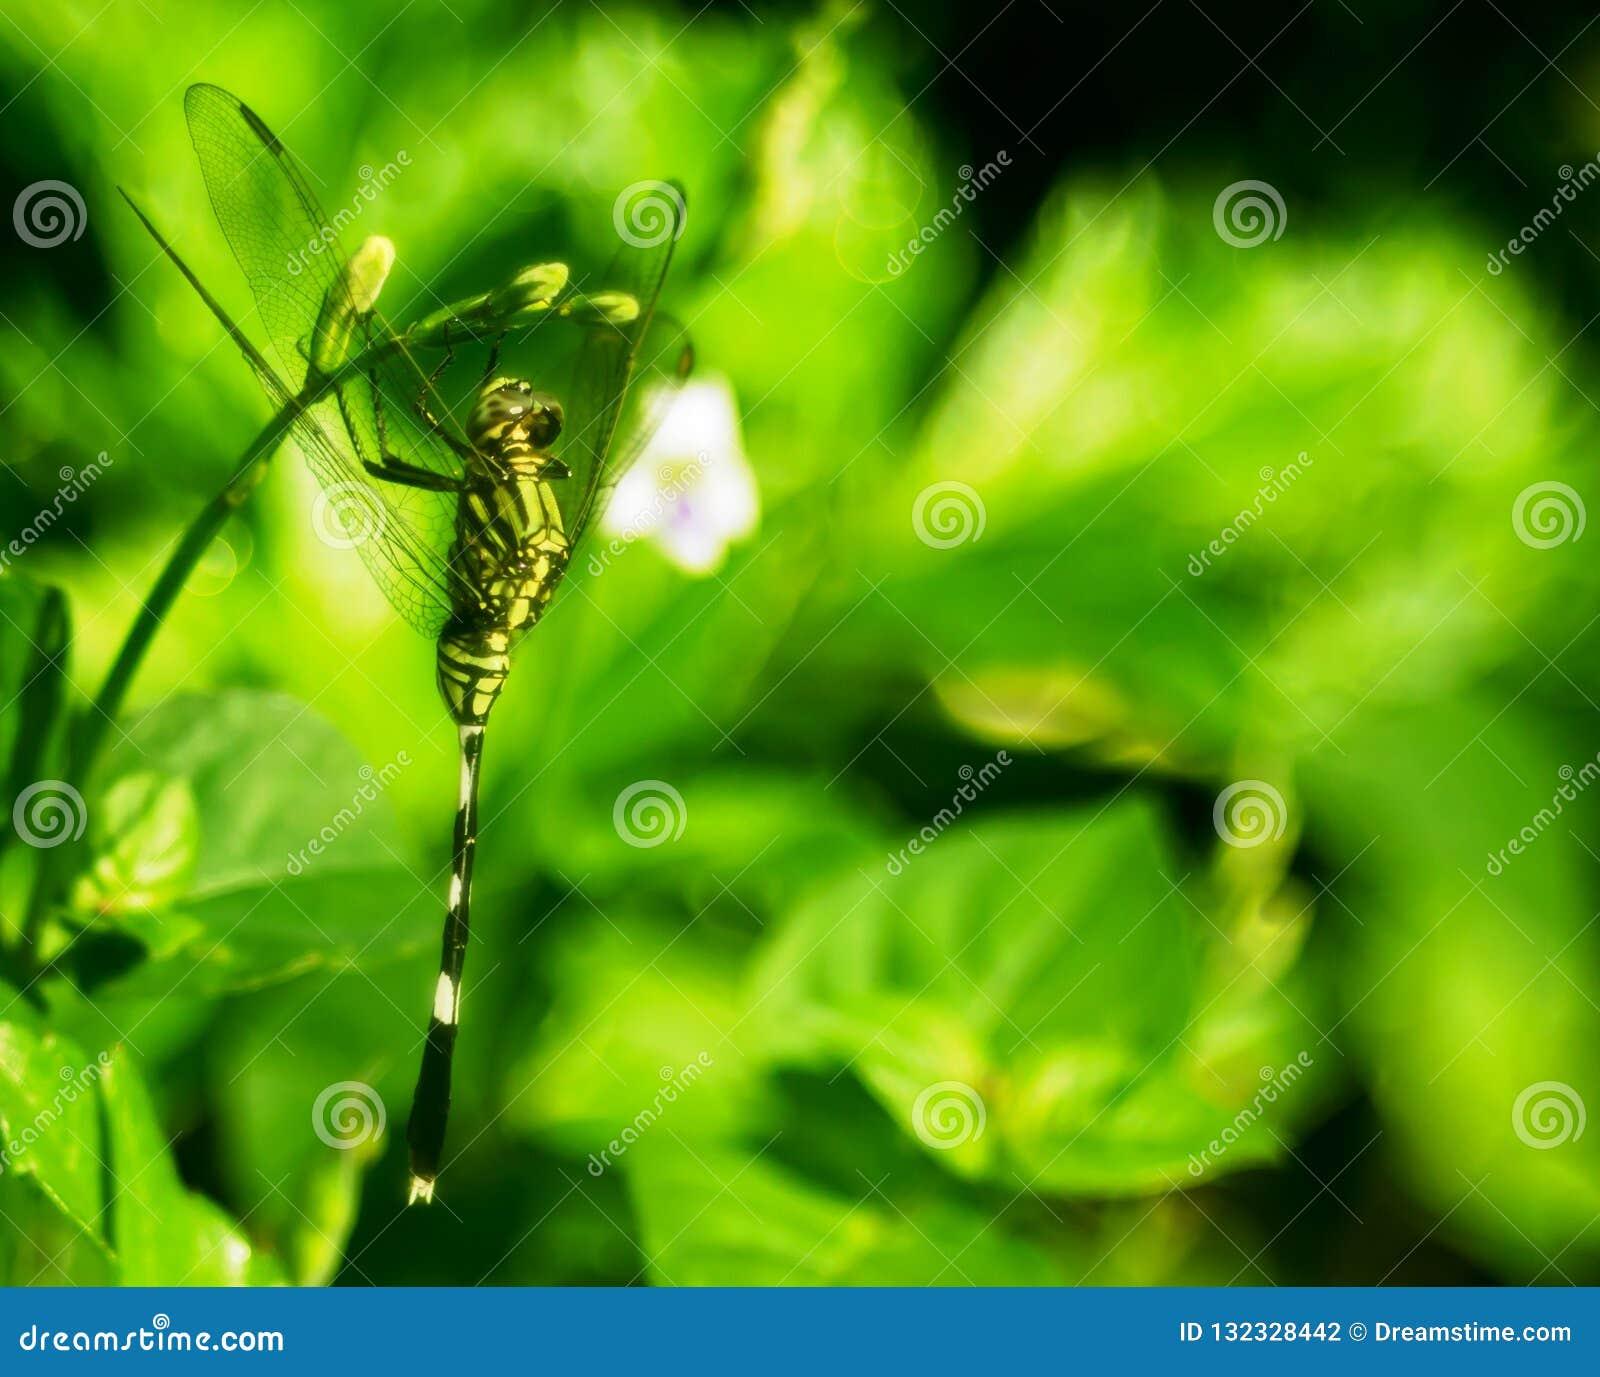 Camouflage d une libellule verte